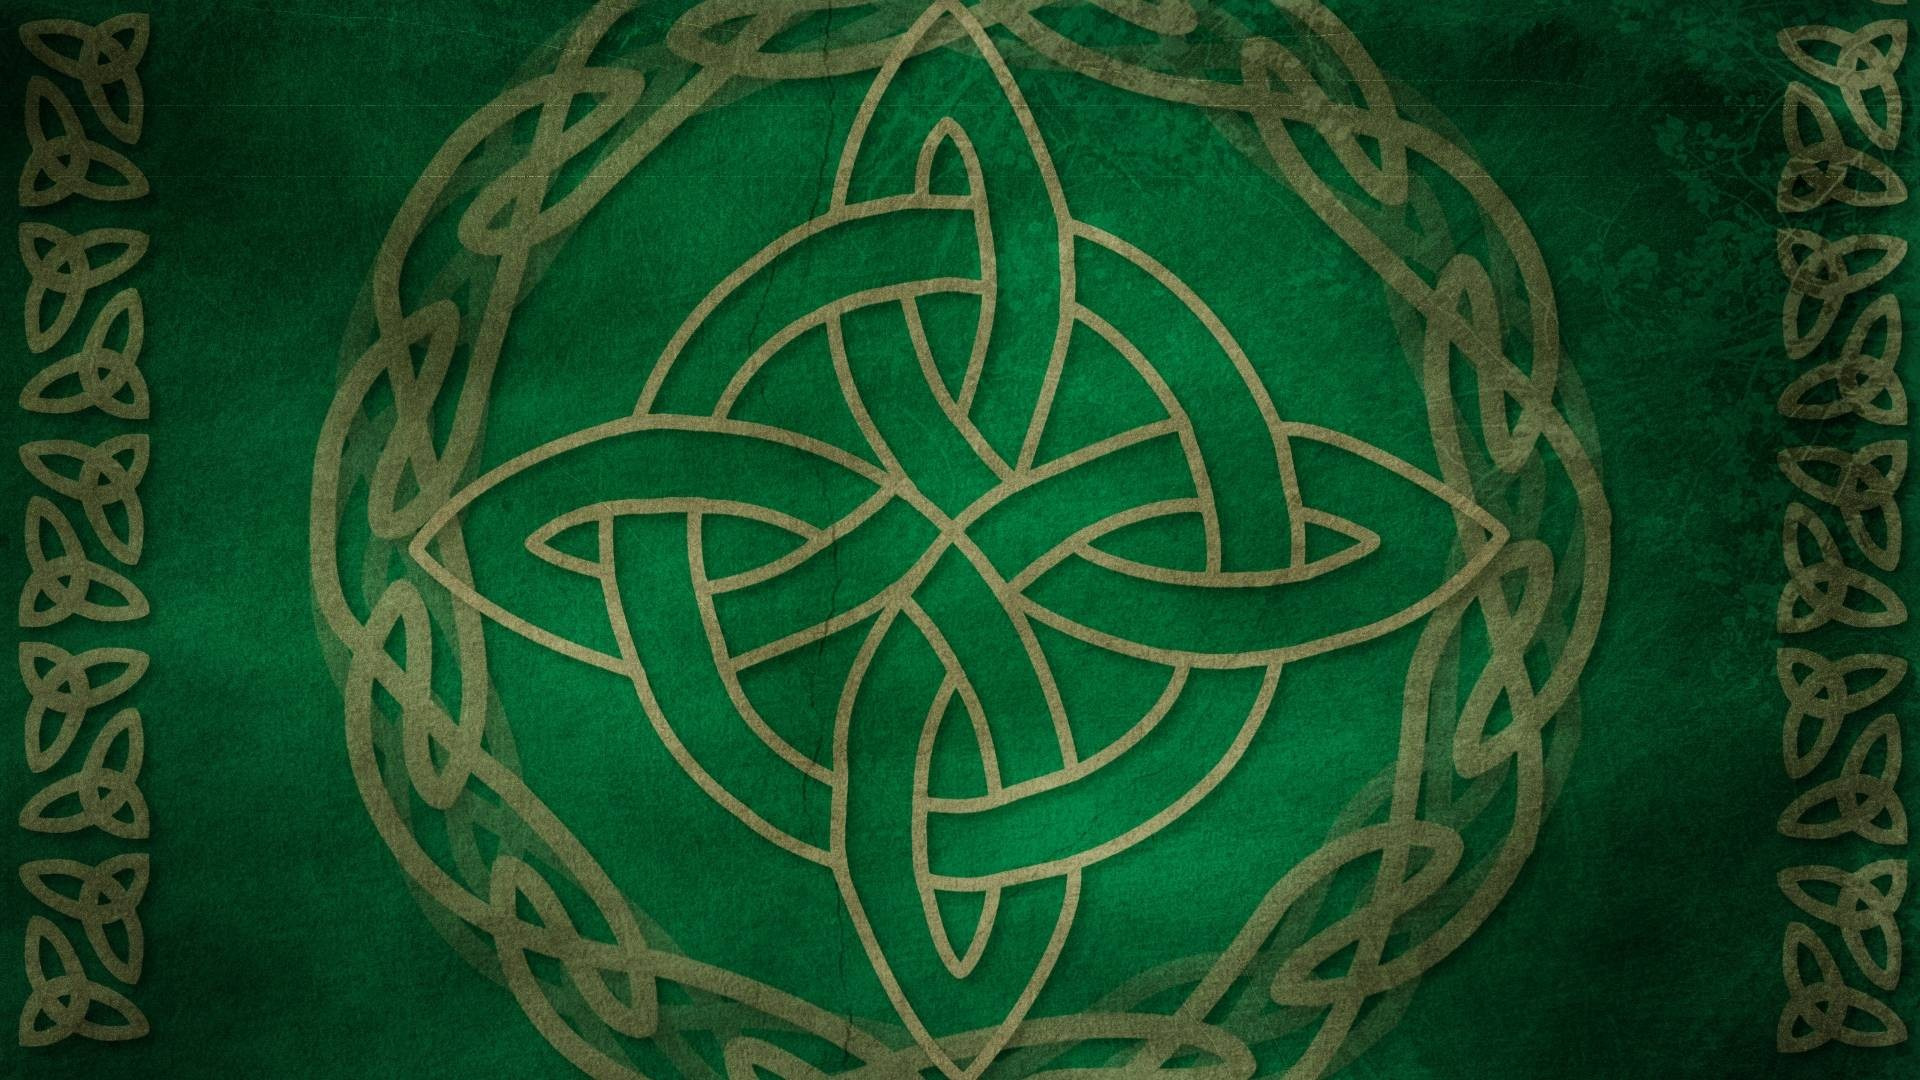 Celtic wallpaper ·① Download free stunning full HD ...